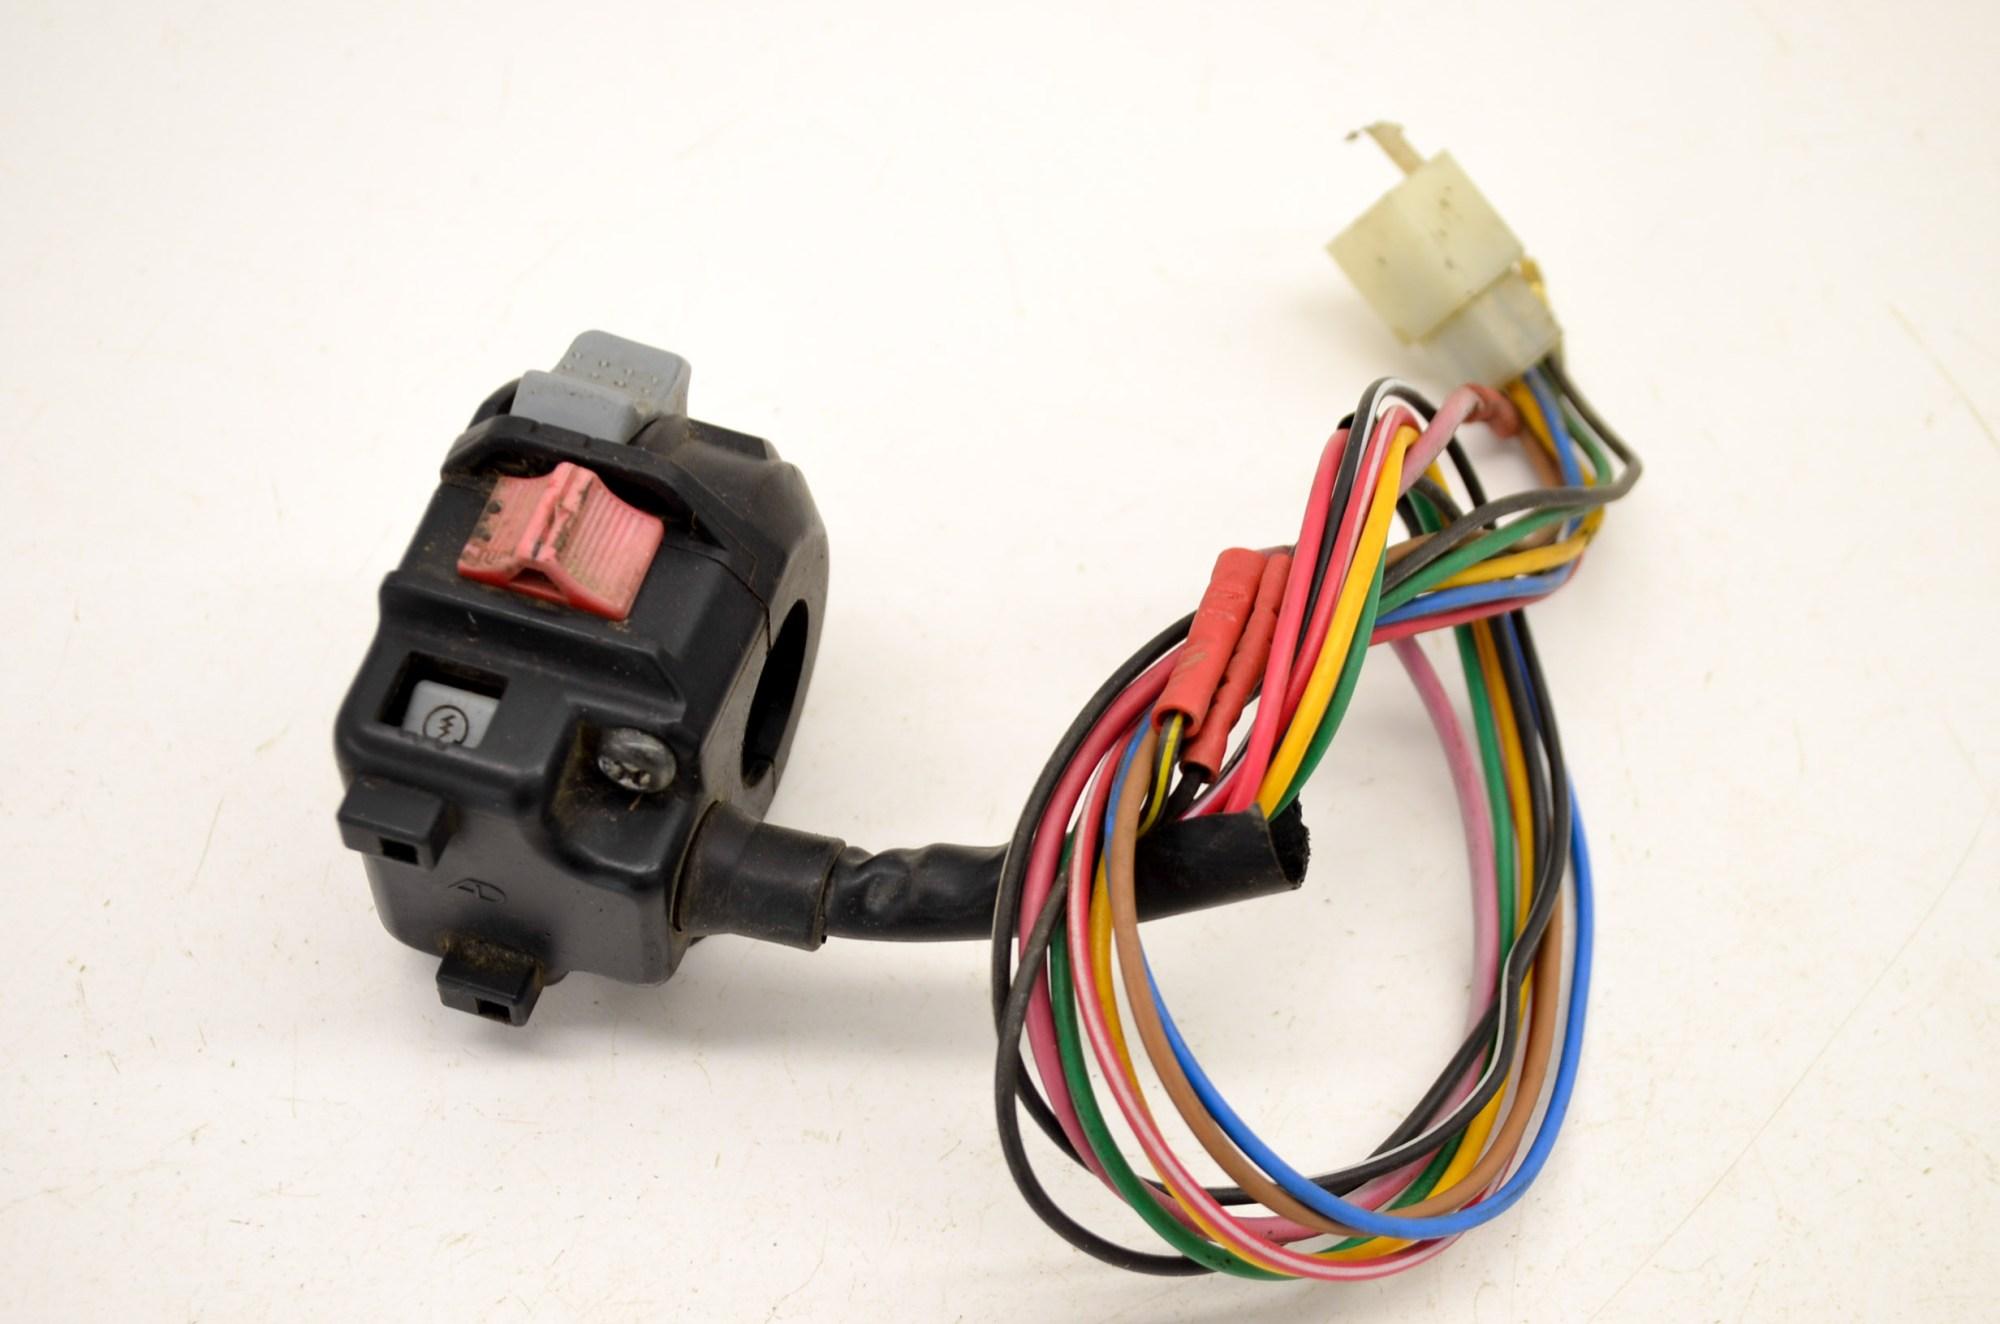 hight resolution of 1997 yamaha timberwolf 250 wire harness wiring 46 wiring